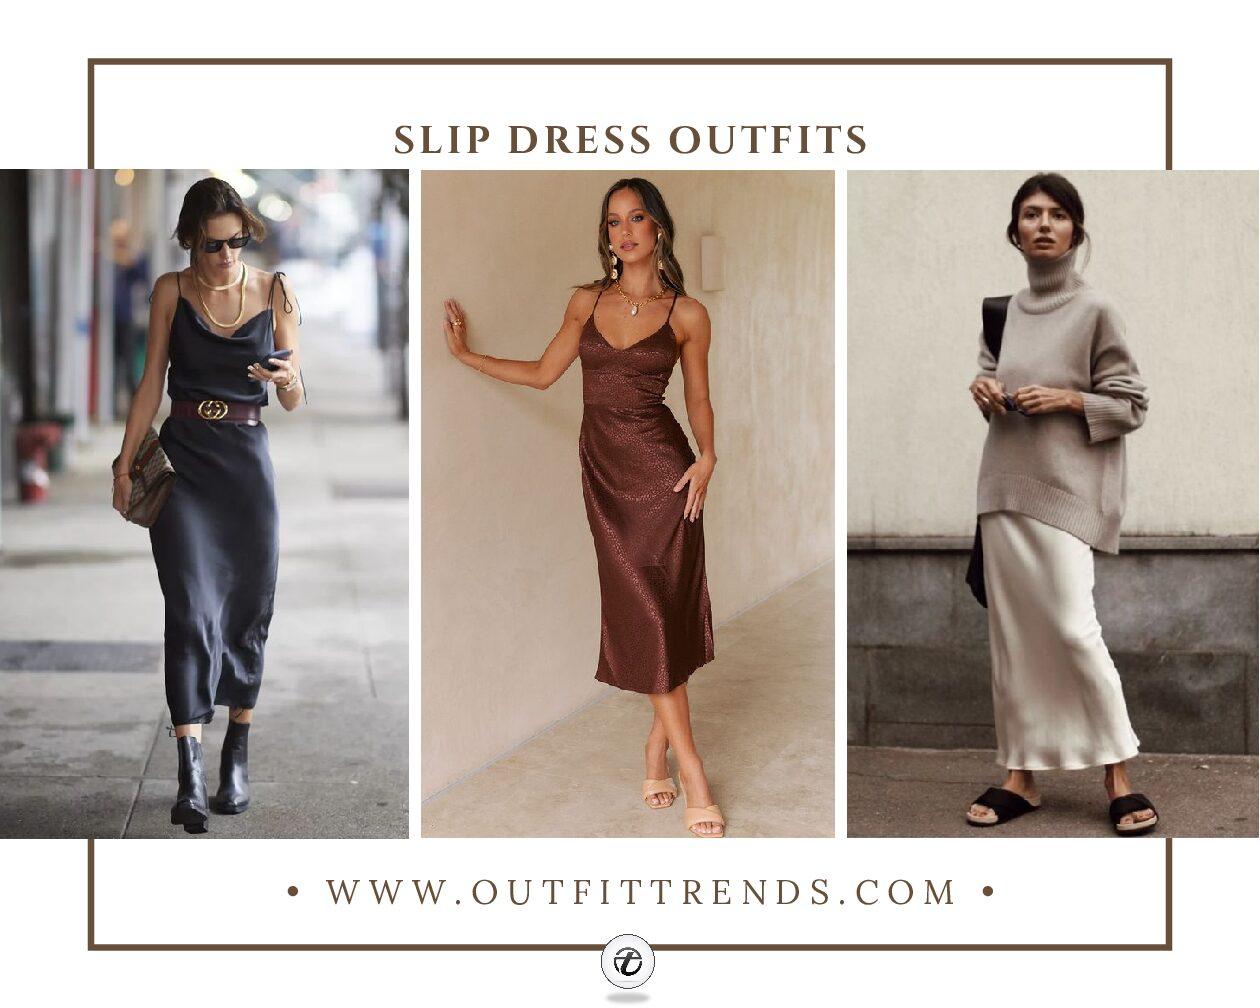 Slip Dress Outfits: 20 Ideas on How To Wear A Slip Dress